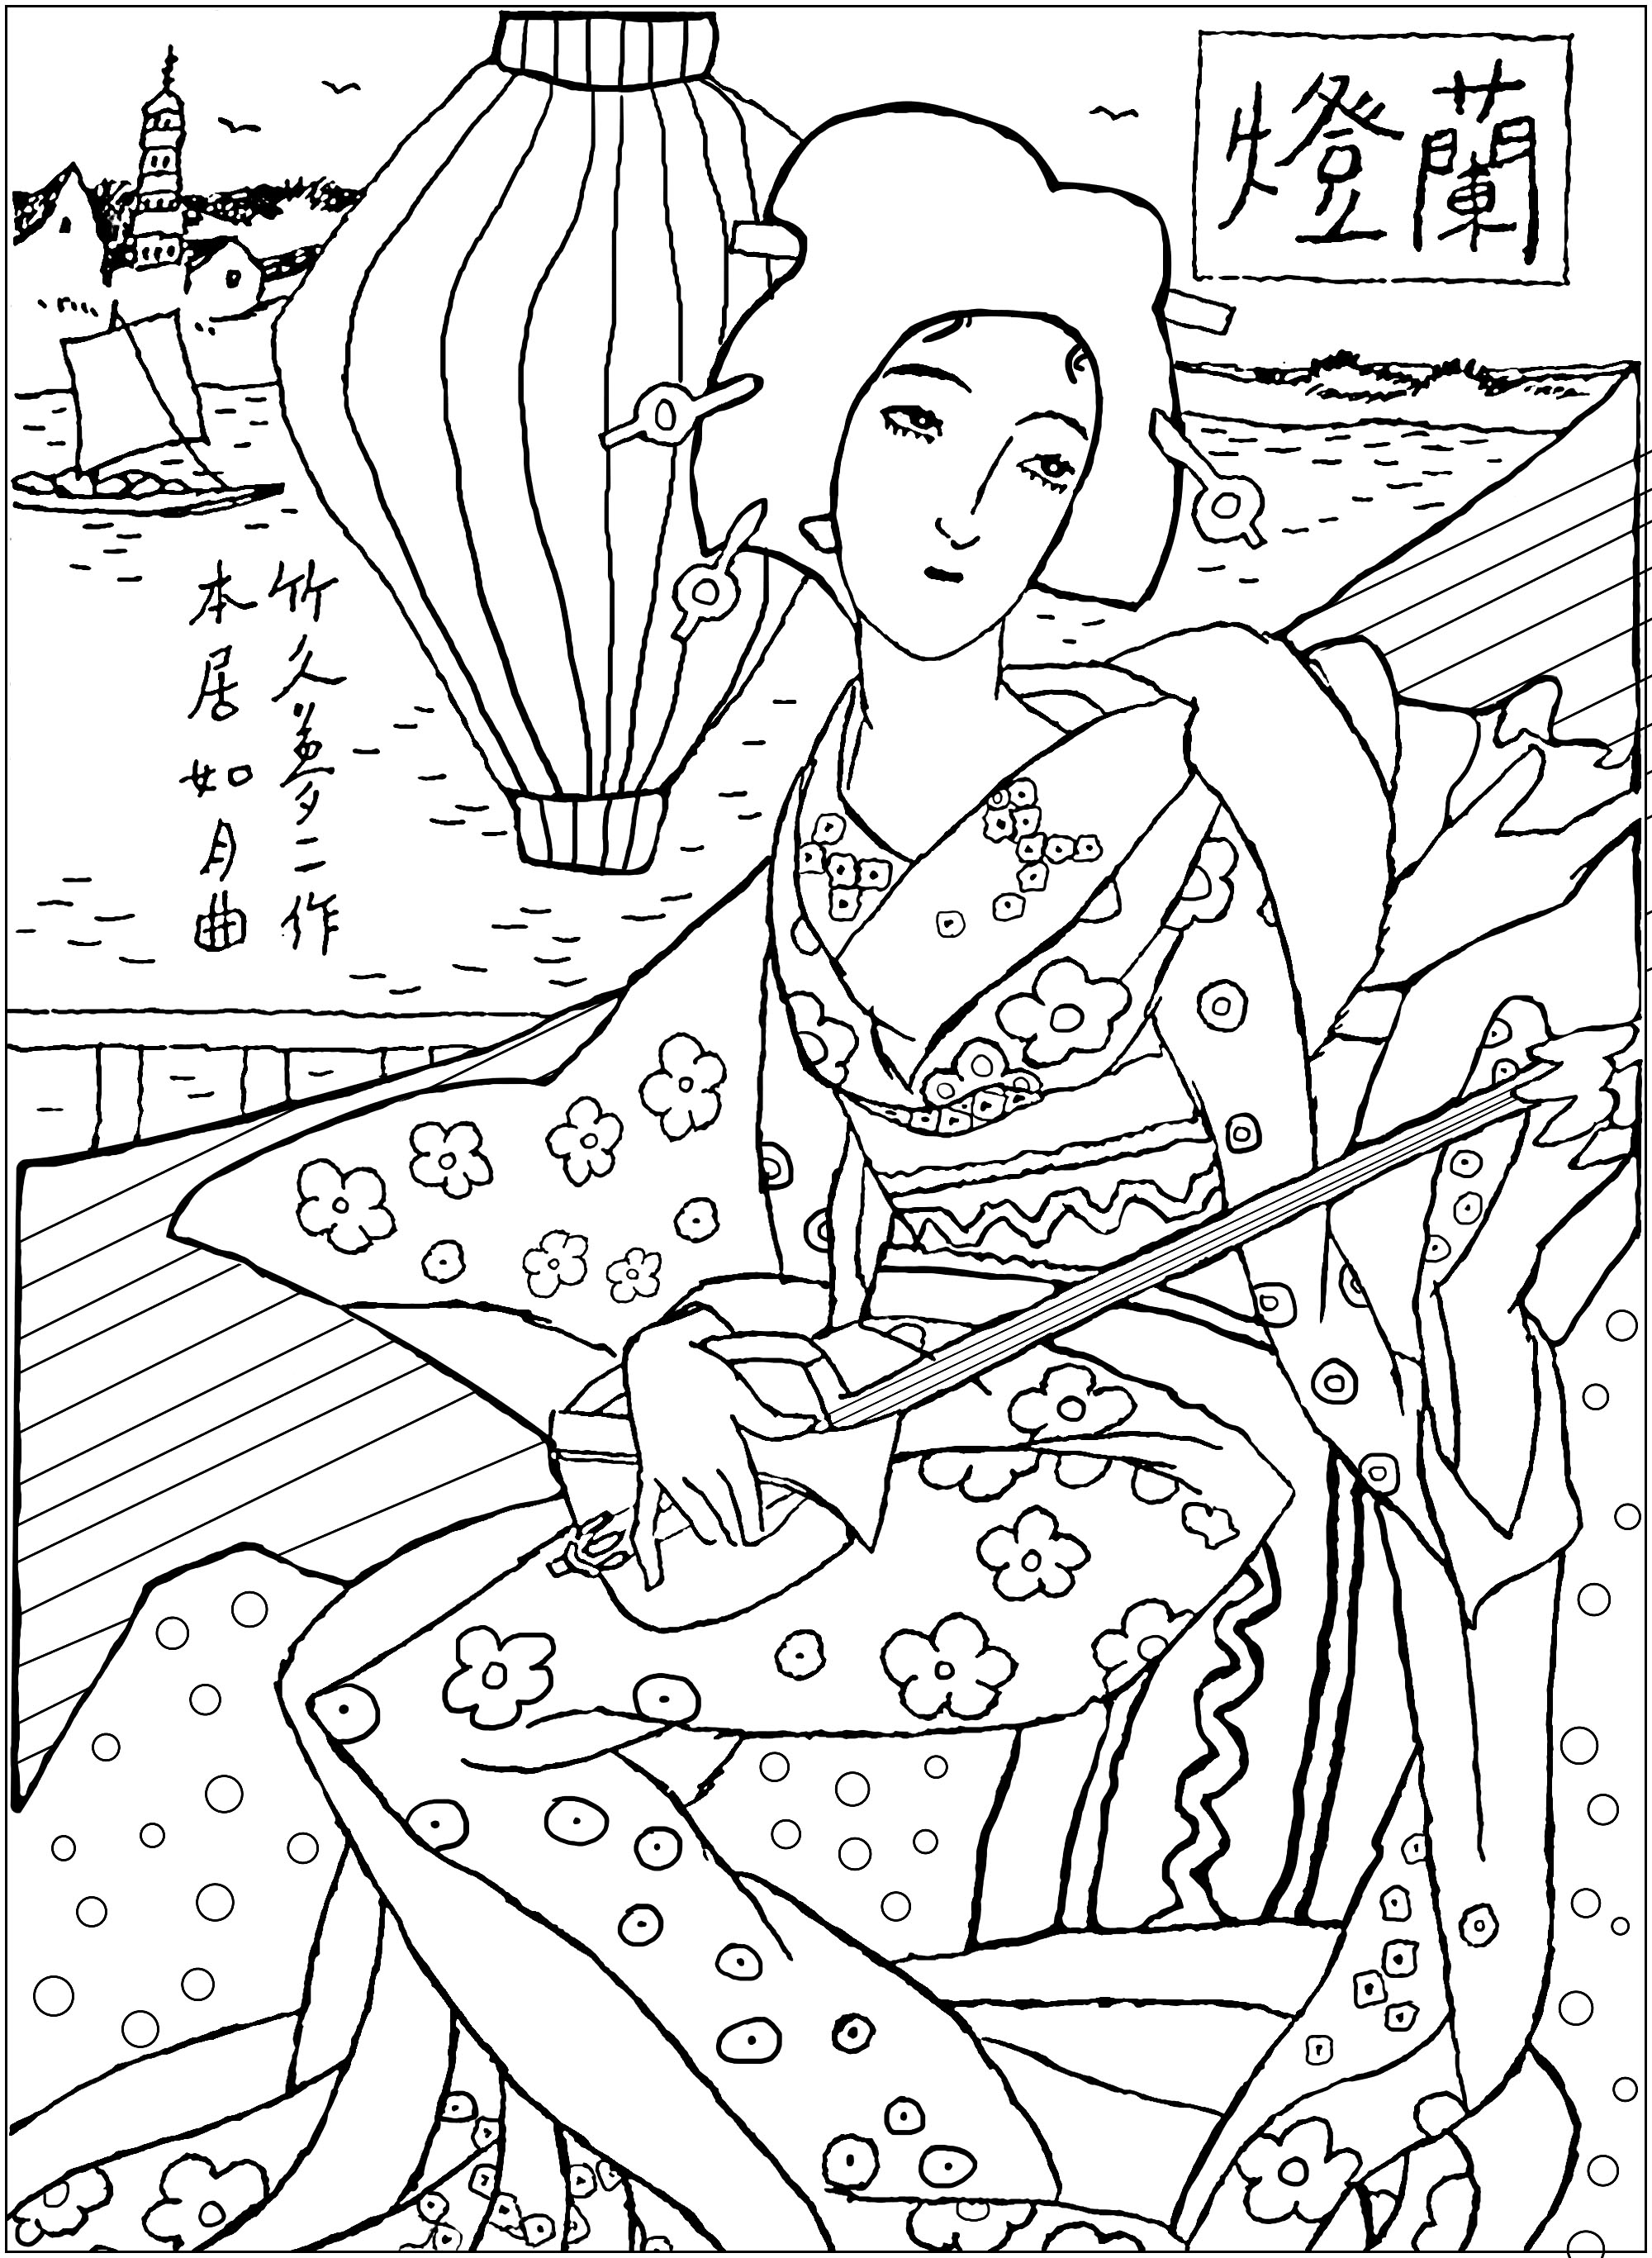 Malbuch Fur Erwachsene : Japan - 1